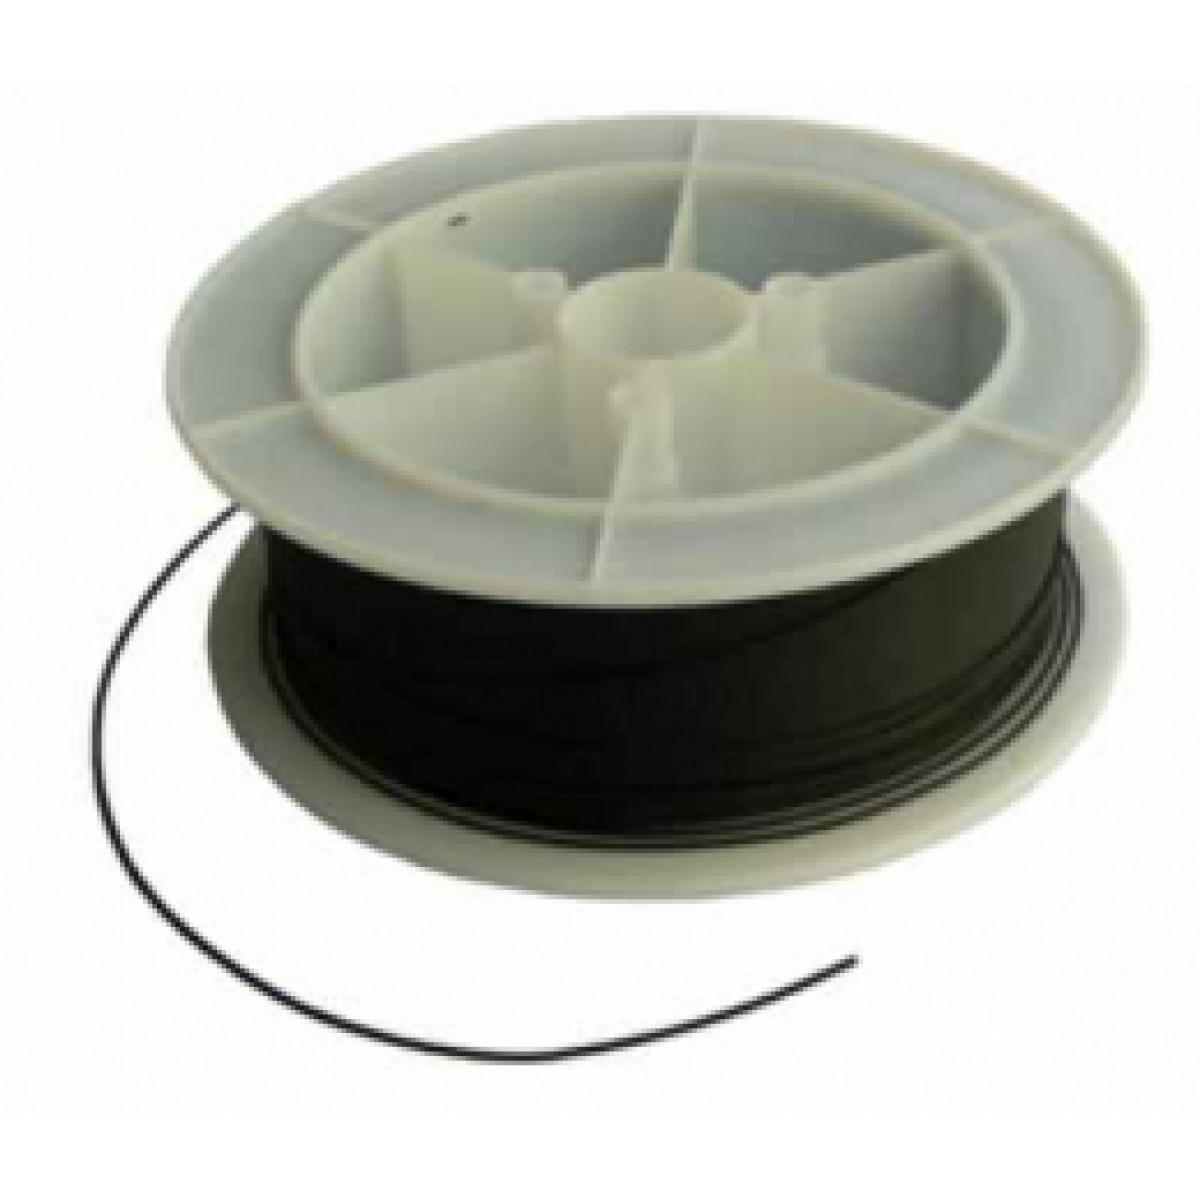 Fibra plastica cobra-pof200 999181 fracarro